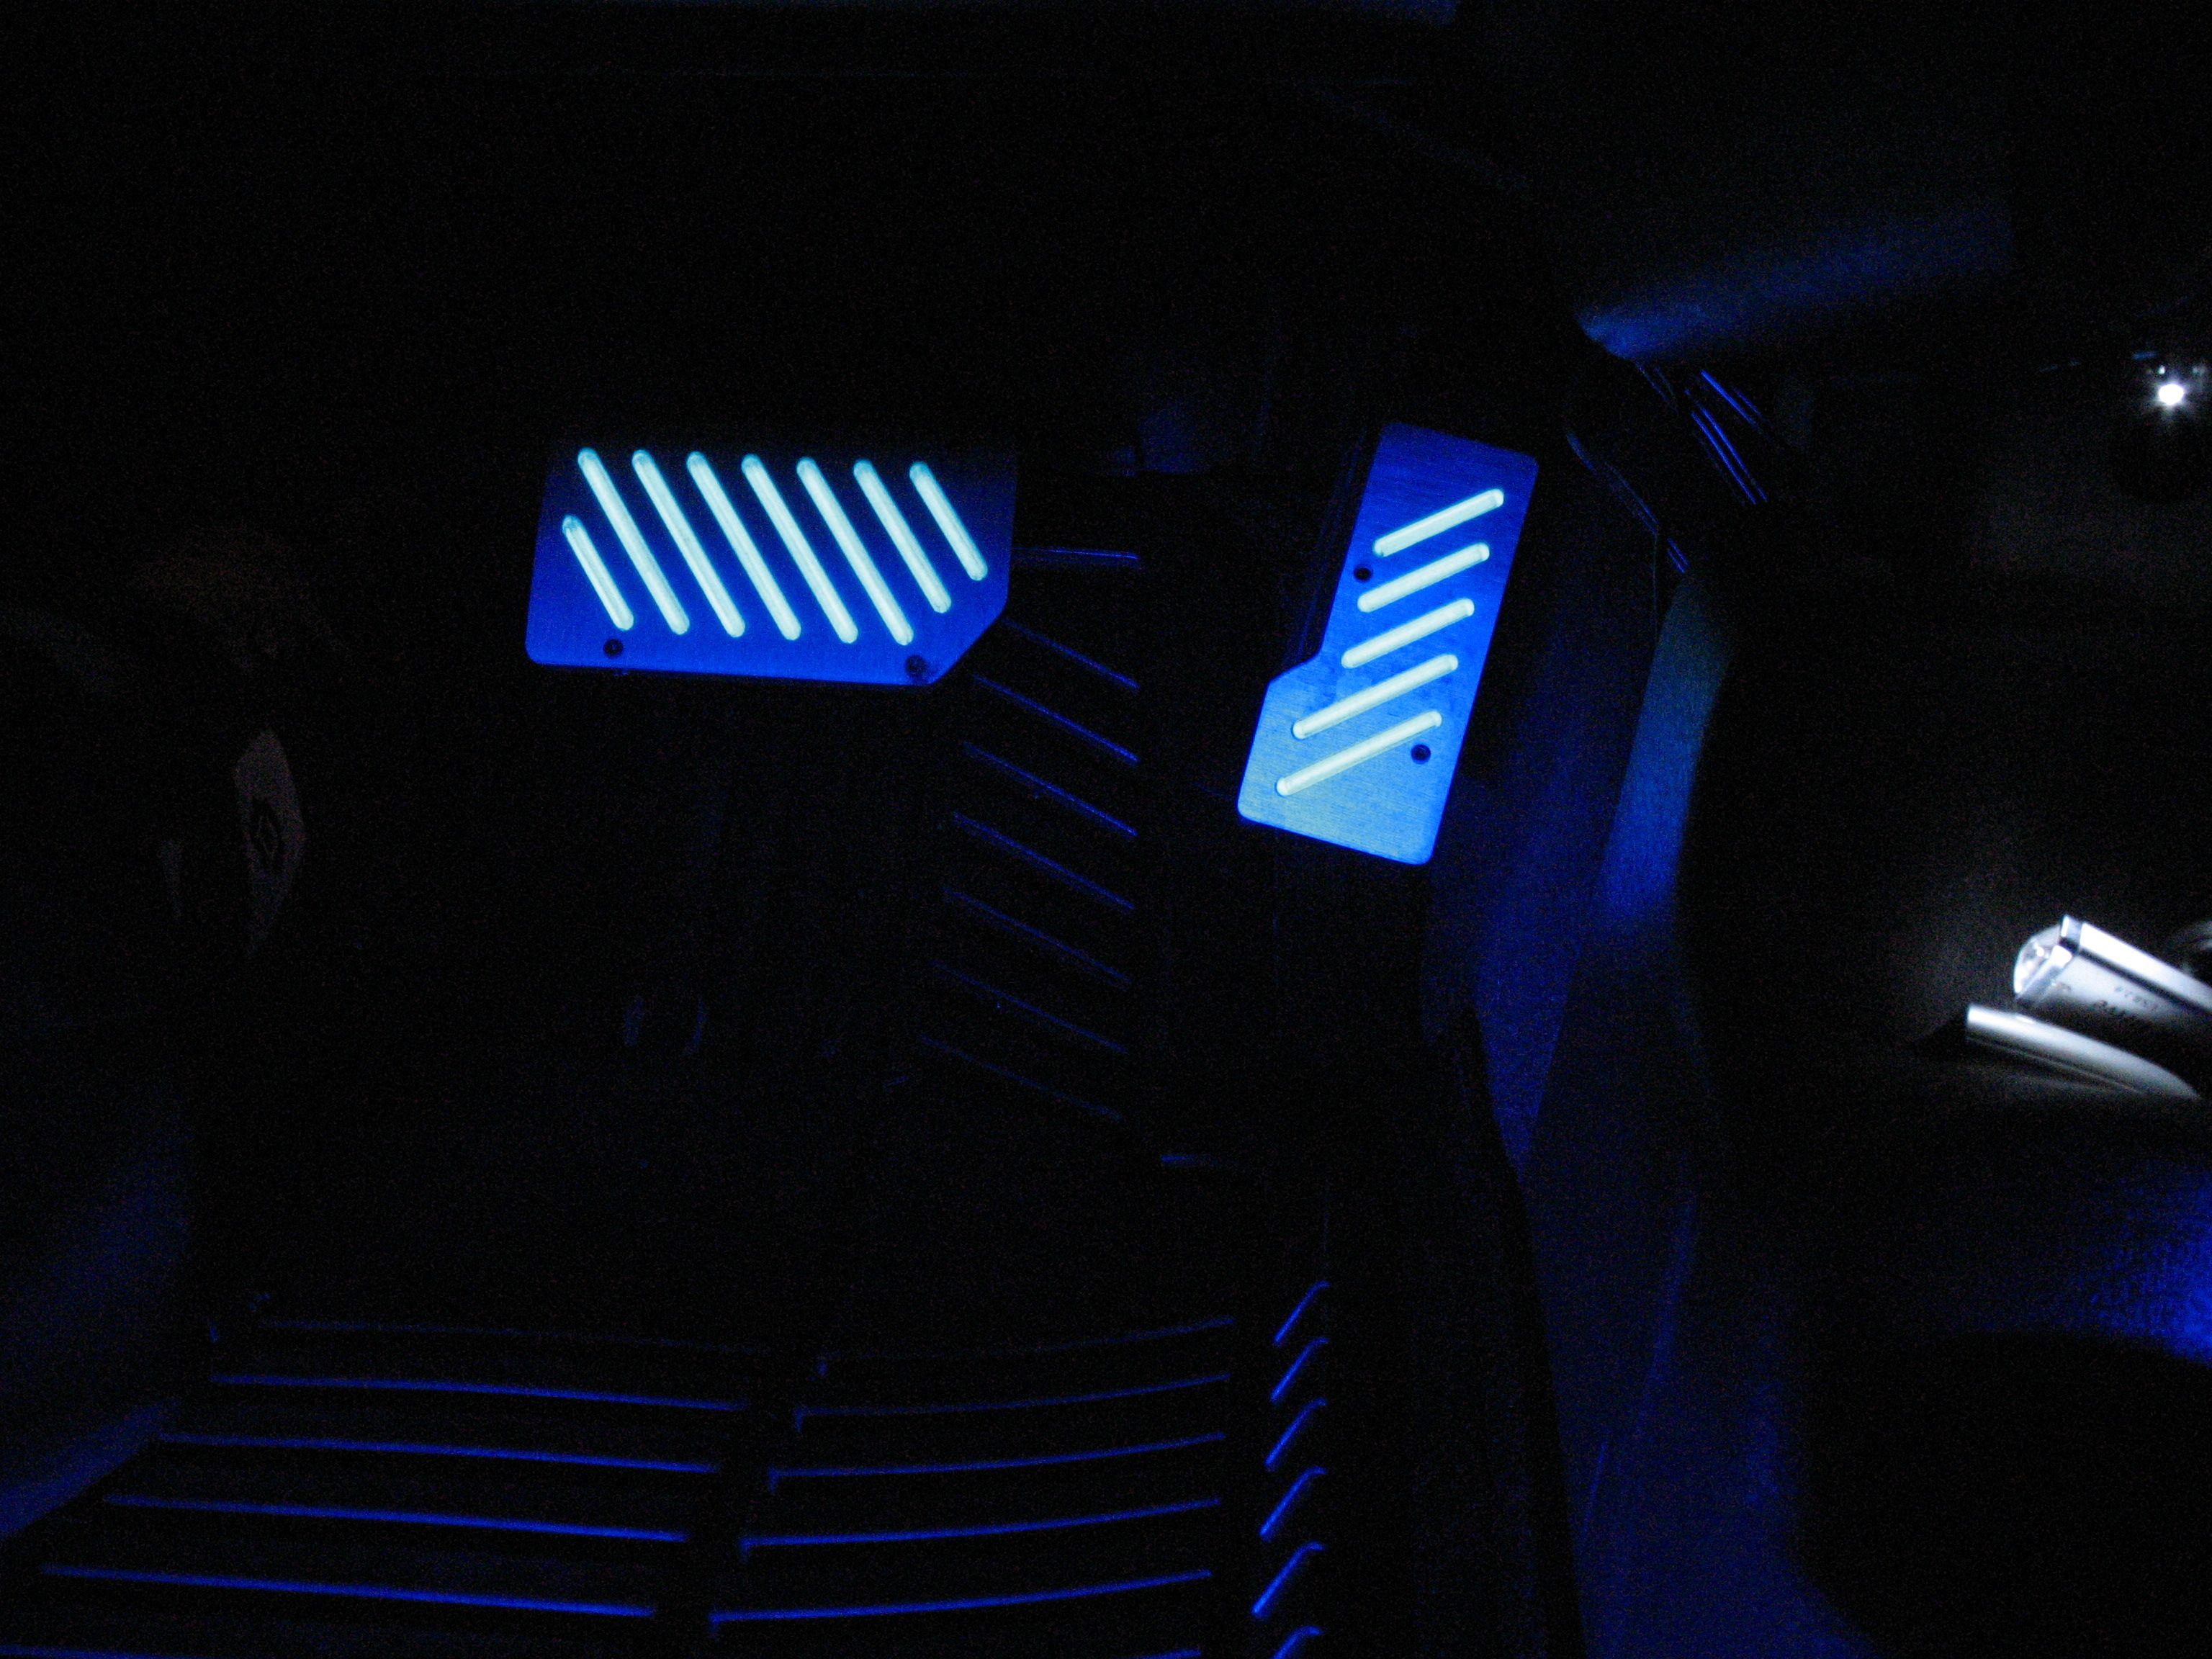 Led Light Strips On Car Pedal Set Led Vehicle Lighting